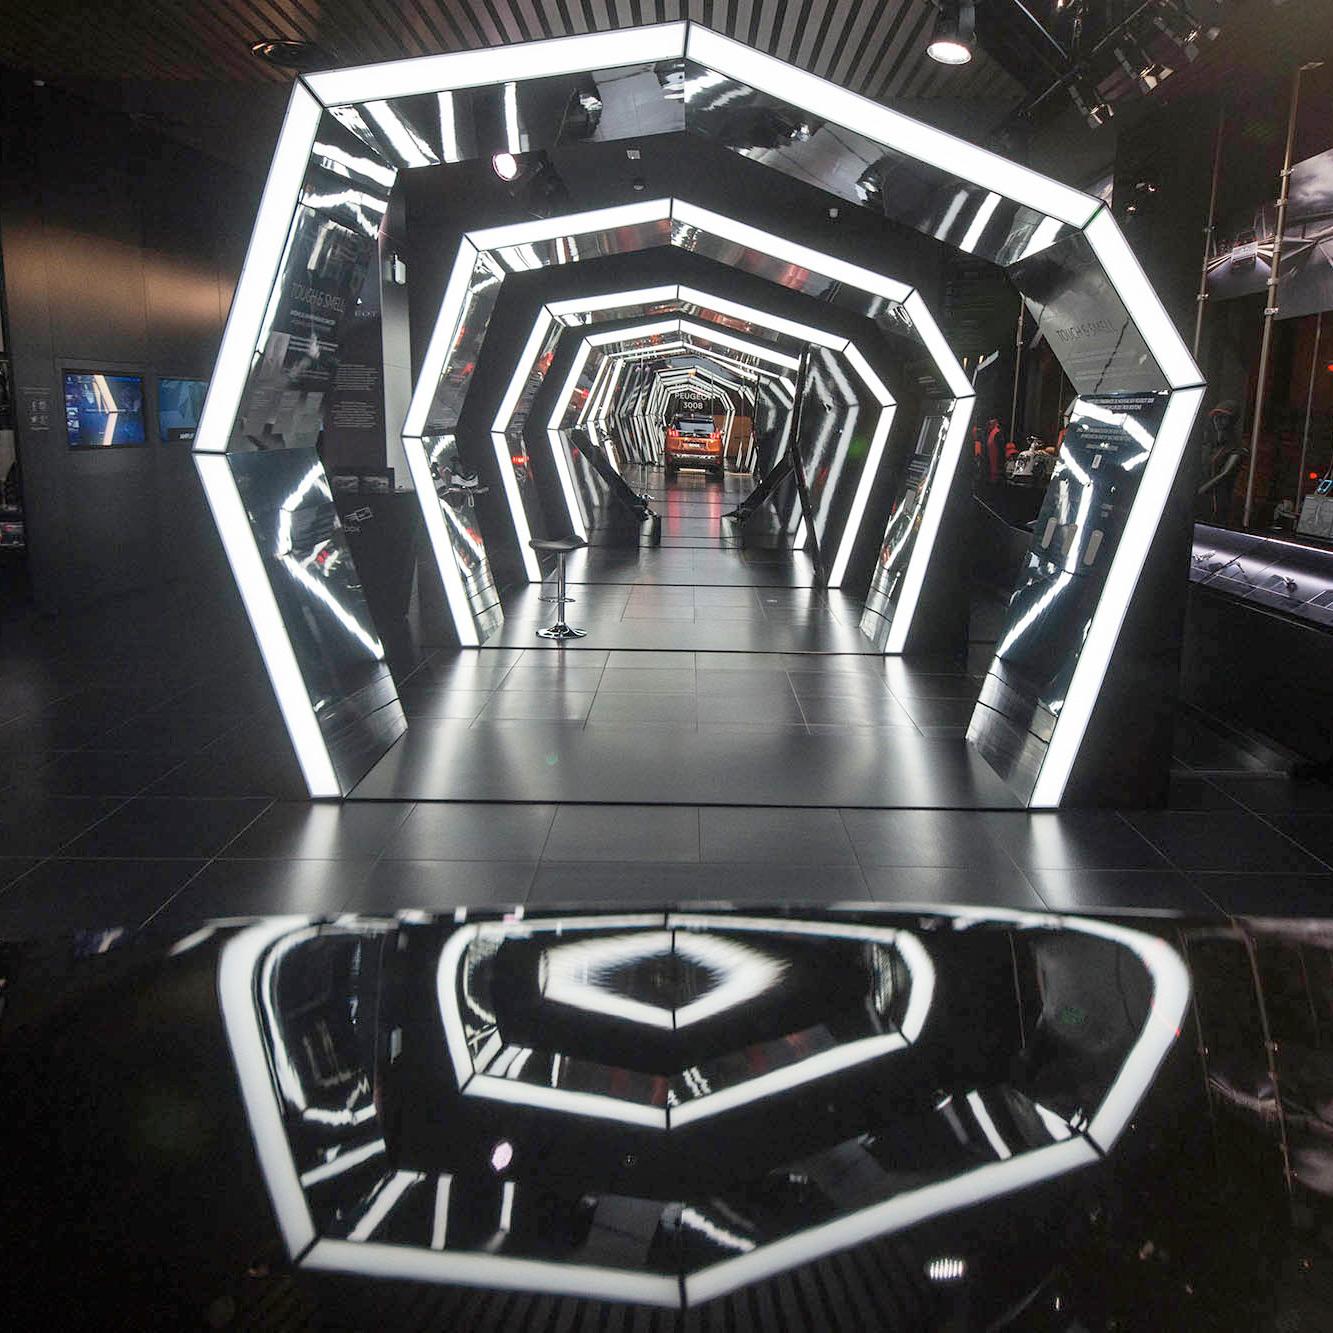 Copie de sceno expo Peugeot Avenue